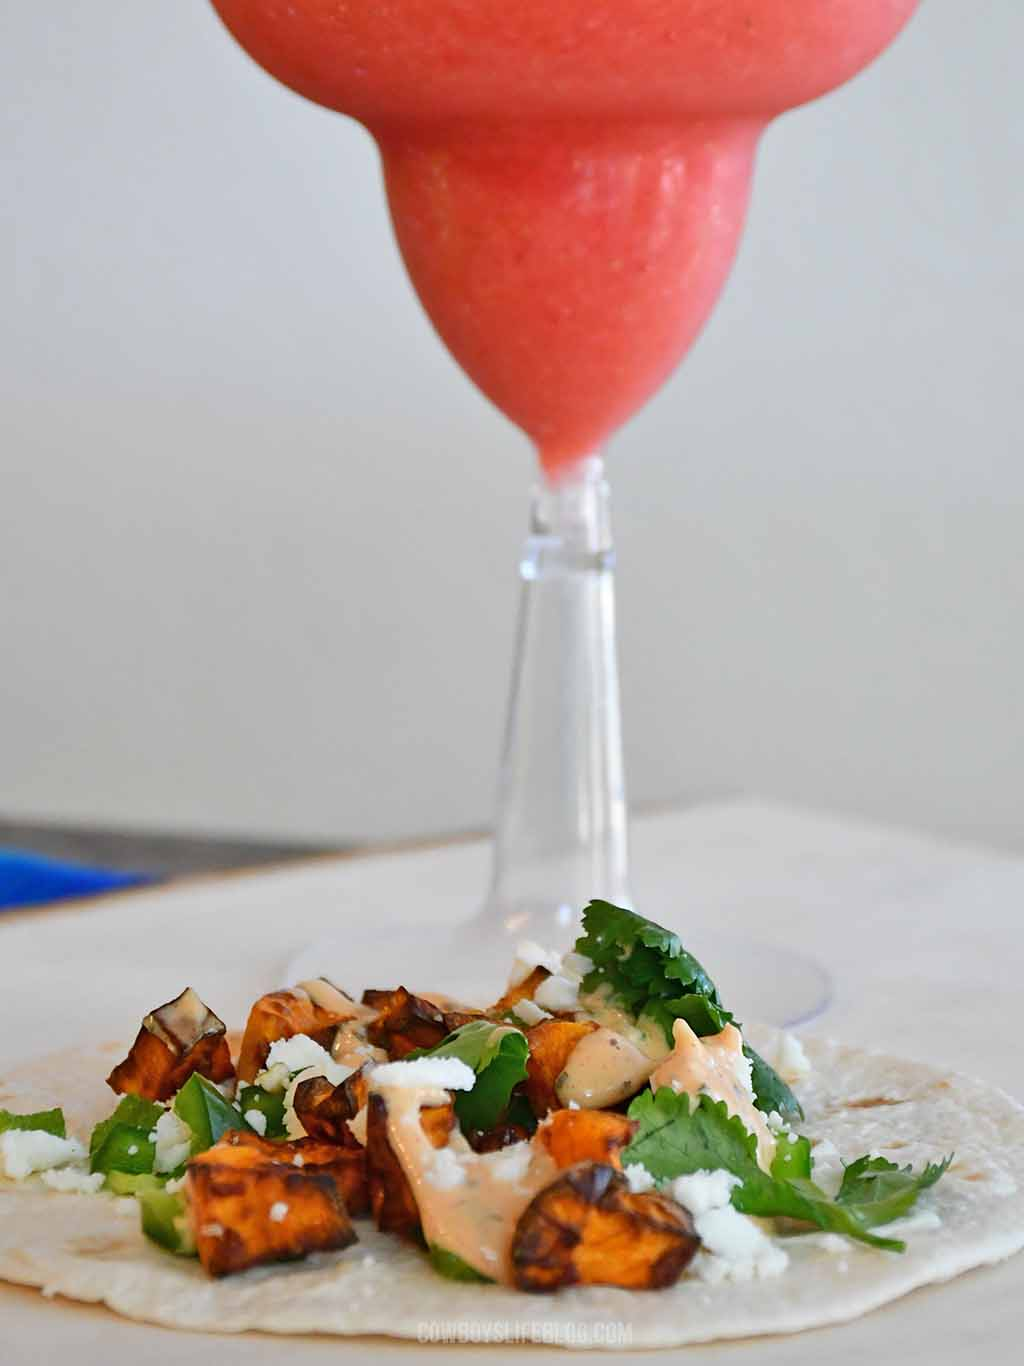 How to make sweet potato tacos